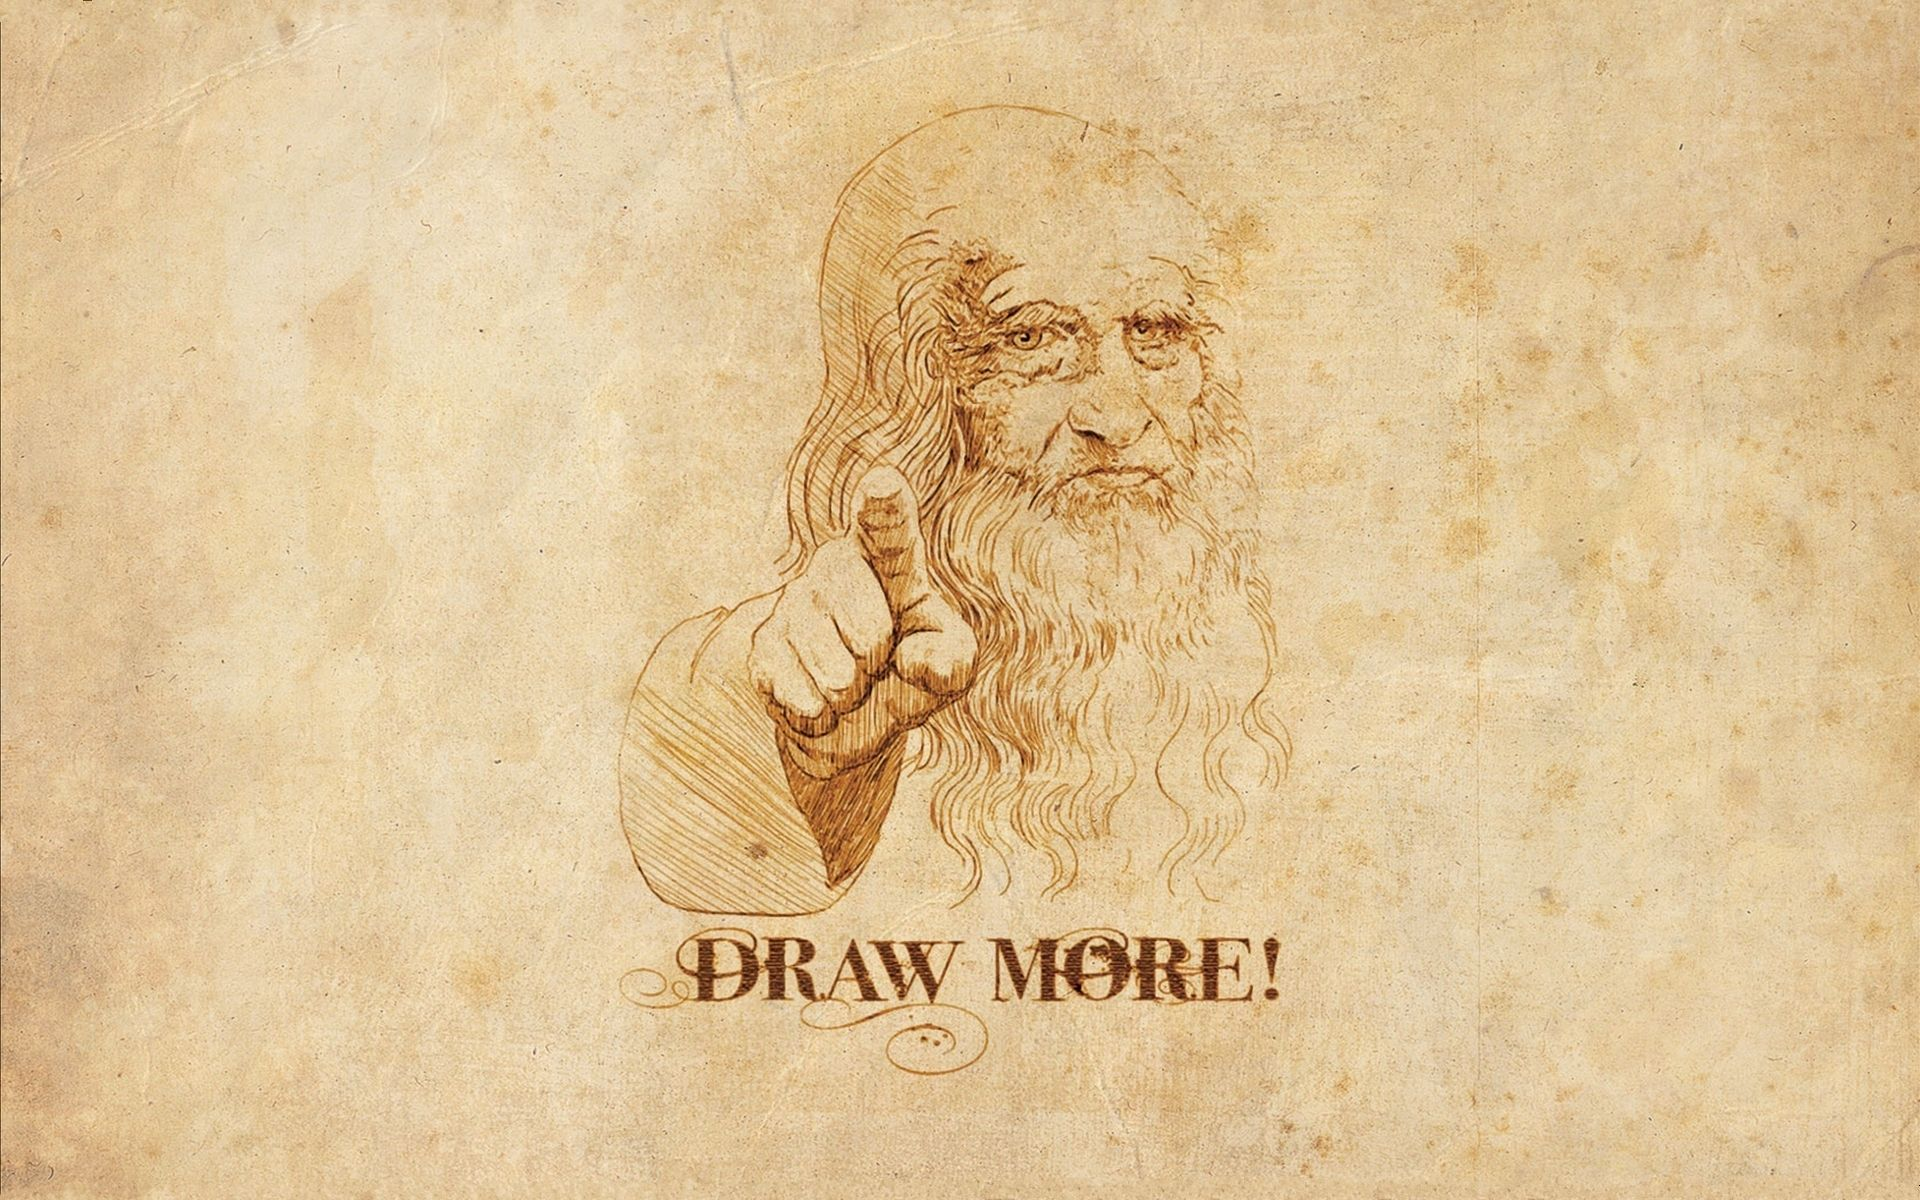 Leonardo Da Vinci Hd Wallpaper Dibujos Arte Y Disenos De Unas